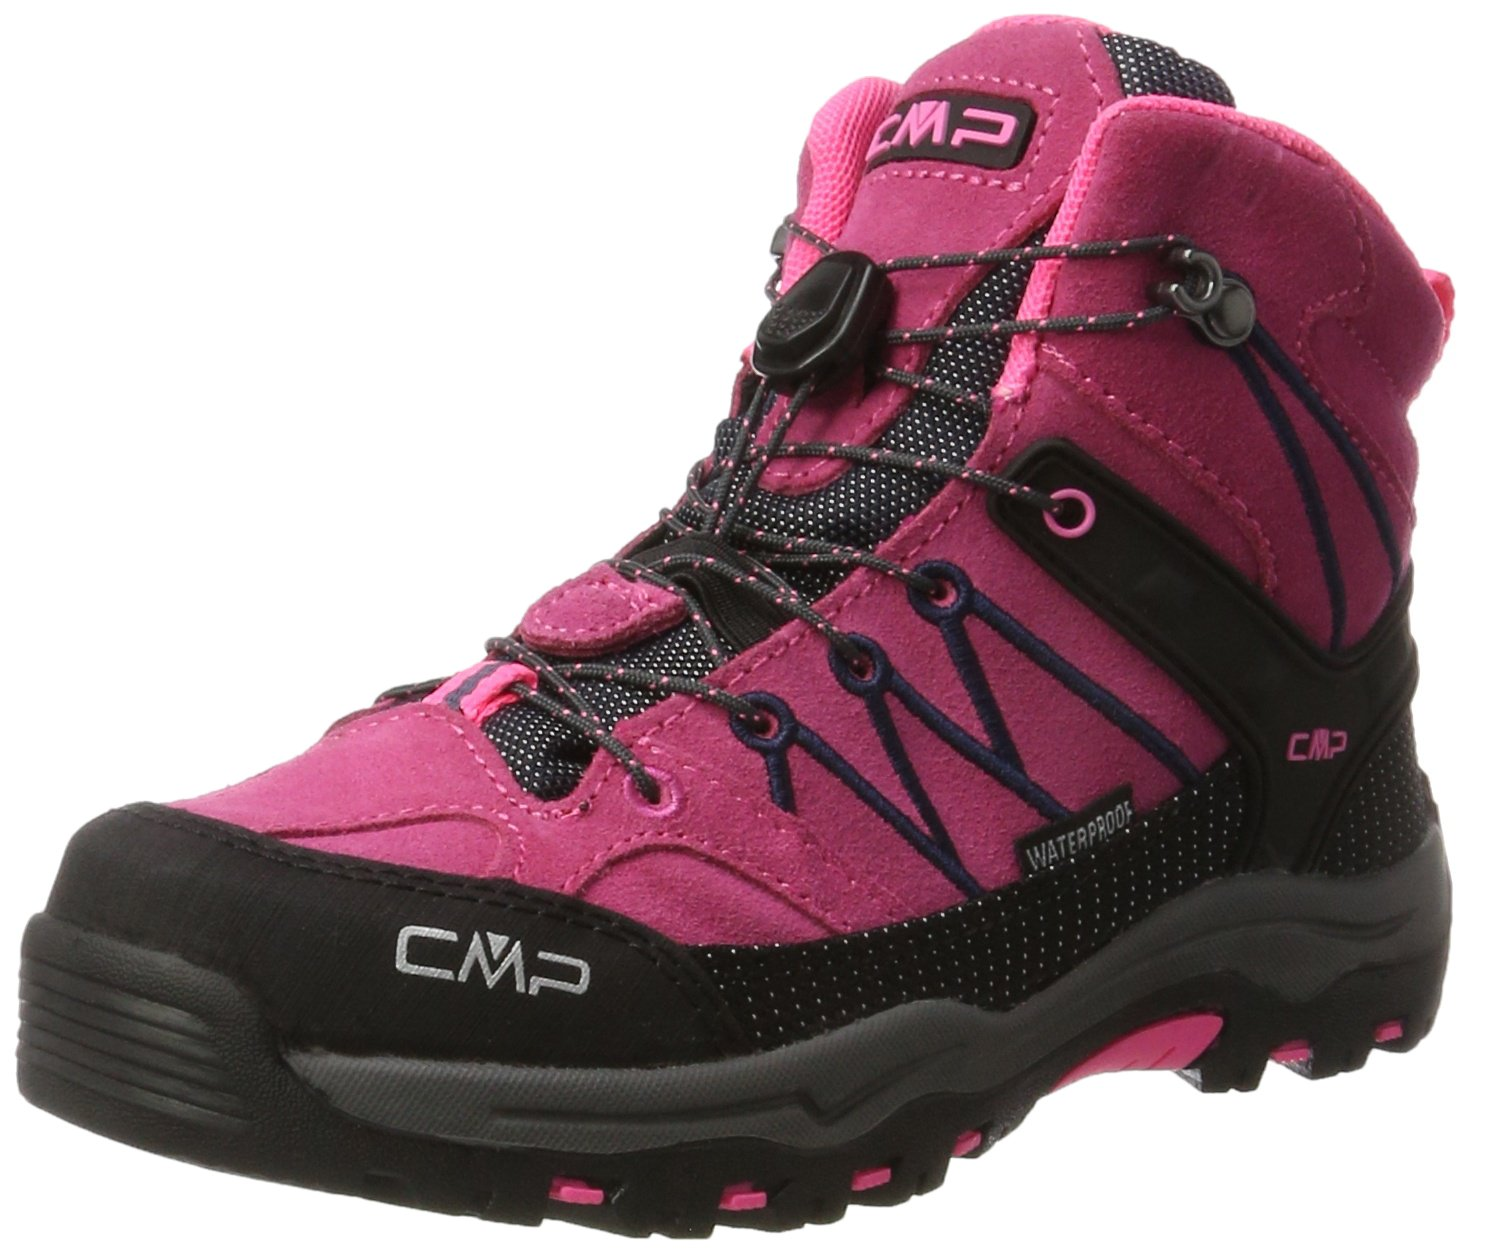 CMP Rigel Mid WP, Zapatos de High Rise Senderismo Unisex Adulto 35 EU|Rosa (Pink Fluo-asphalt)